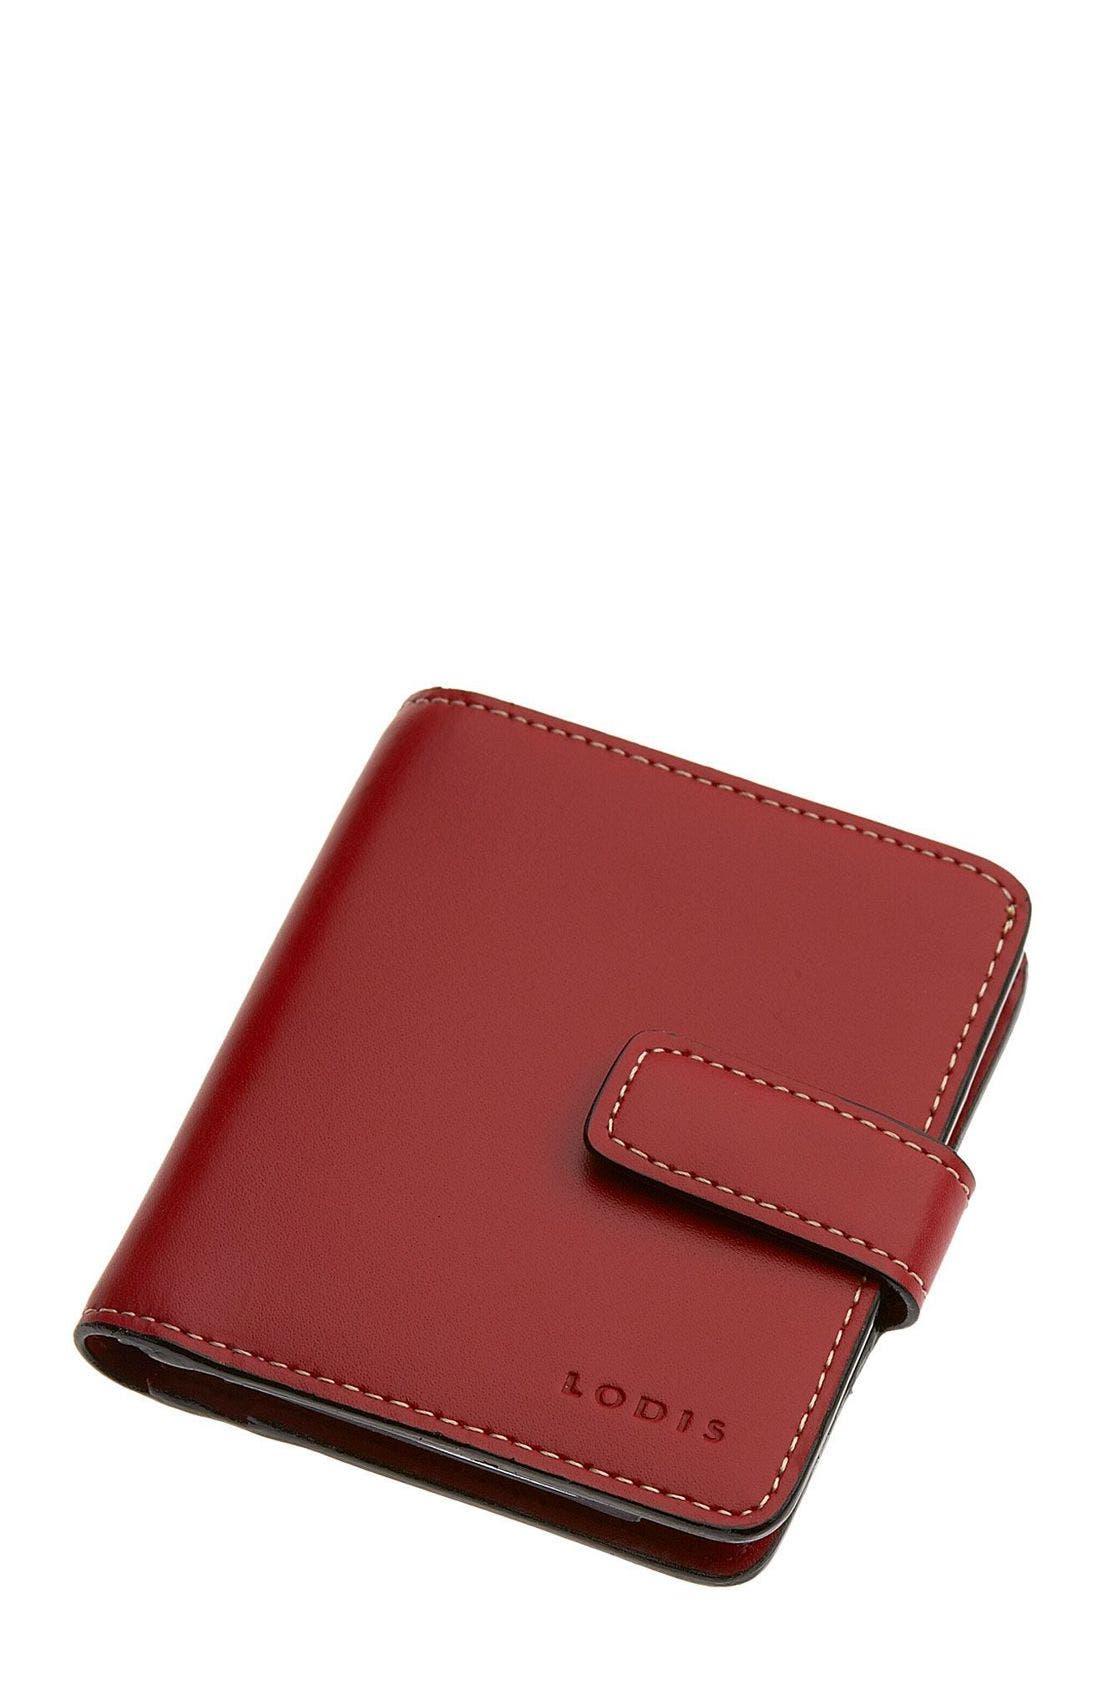 Main Image - Lodis 'Audrey' Wallet